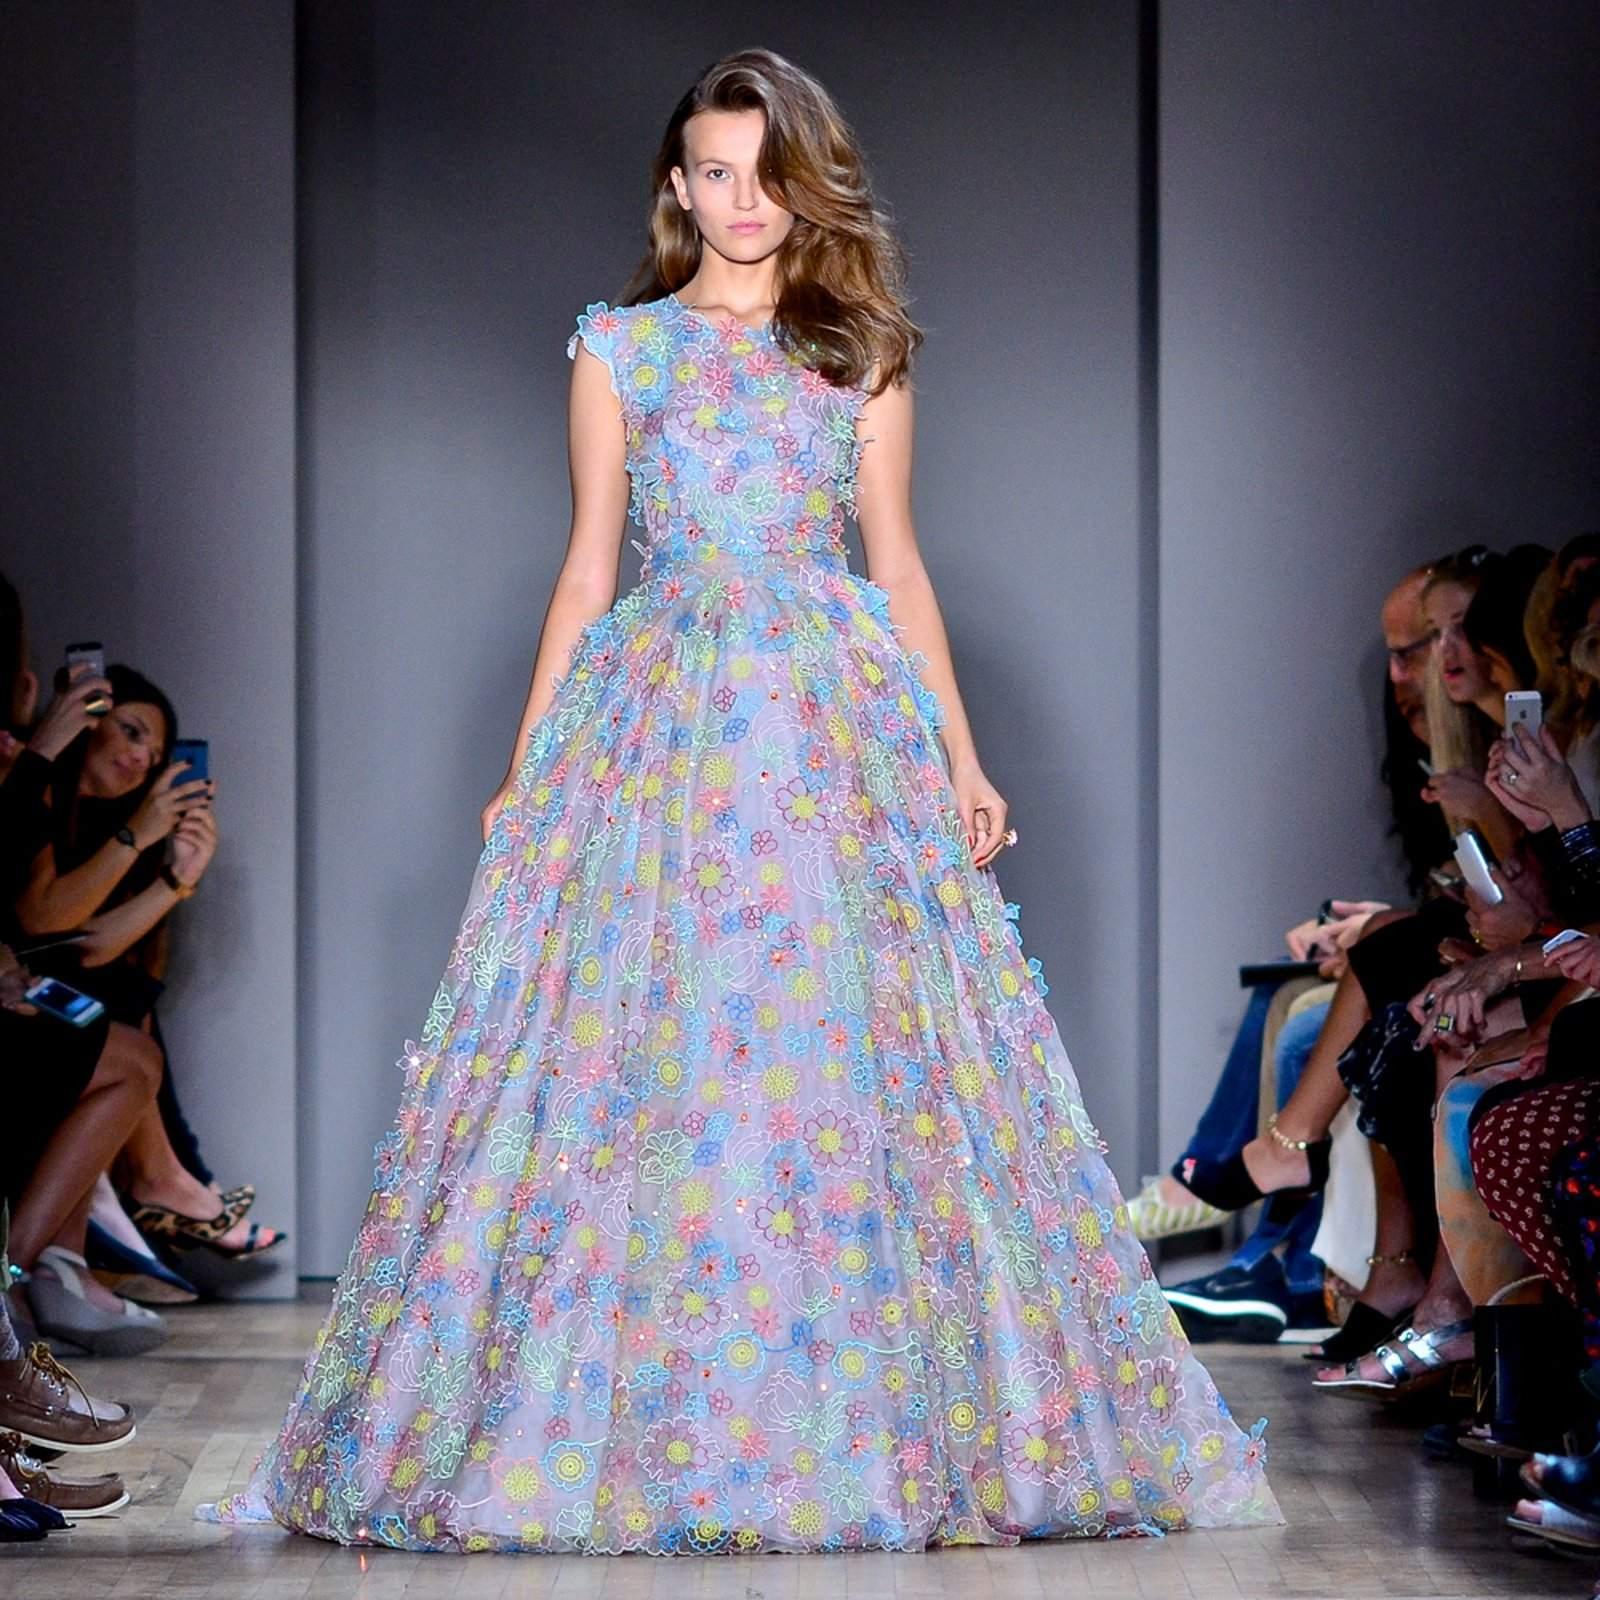 jenny packham9 Jenny Packham Spring/Summer Collection 2015 at NYC Fashion Week